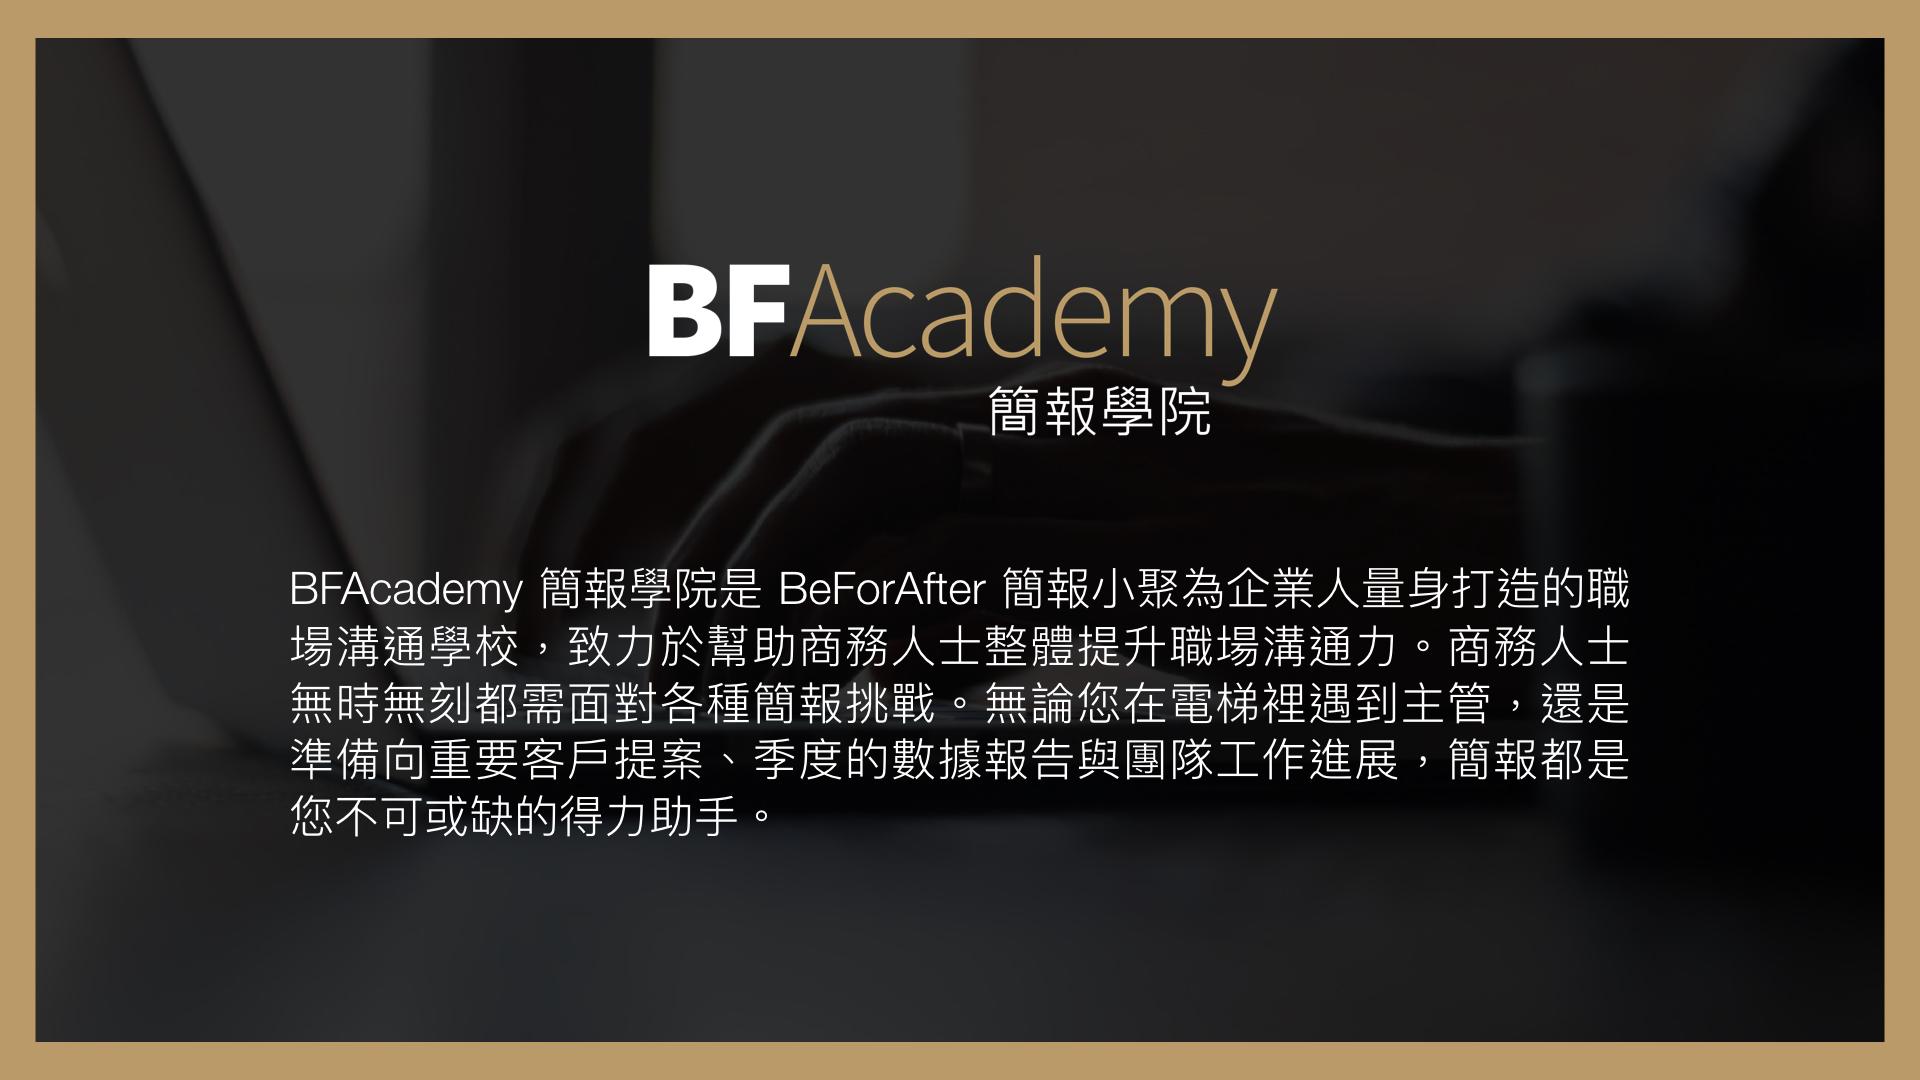 BFAcademy #6 羅鈞鴻 .002.jpeg